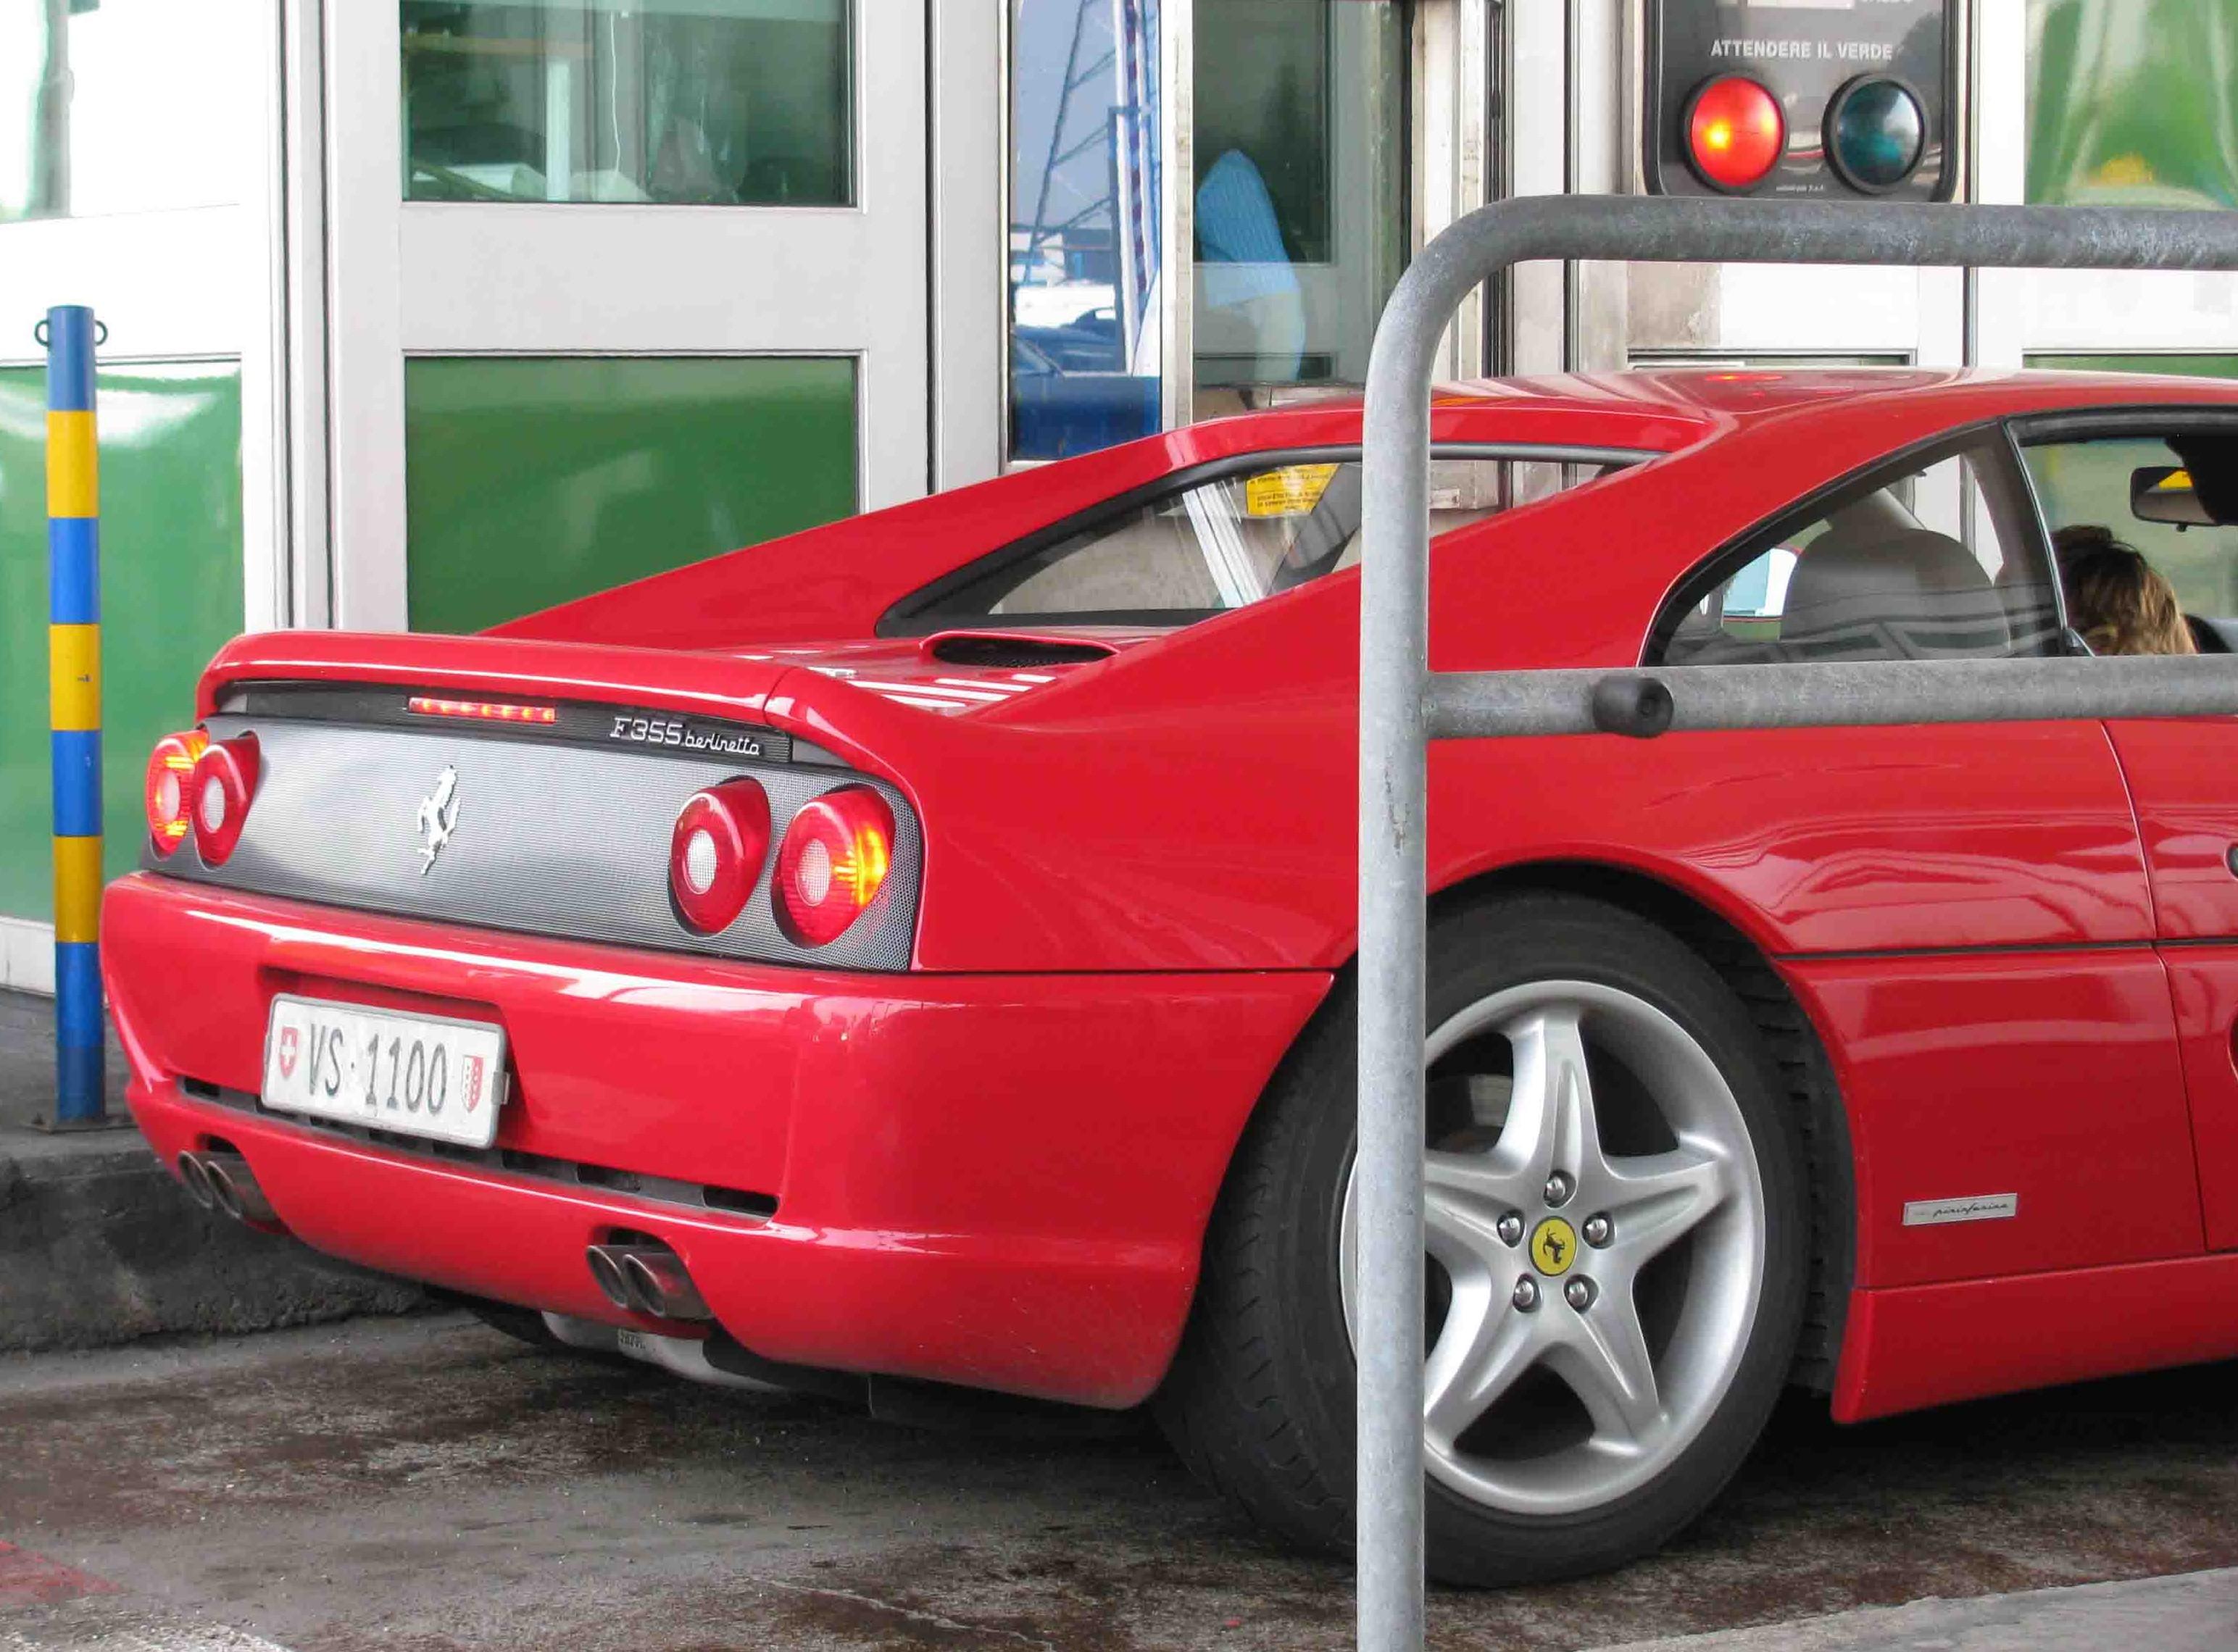 Road Tolls + Vignettes | DriveEuropeNews